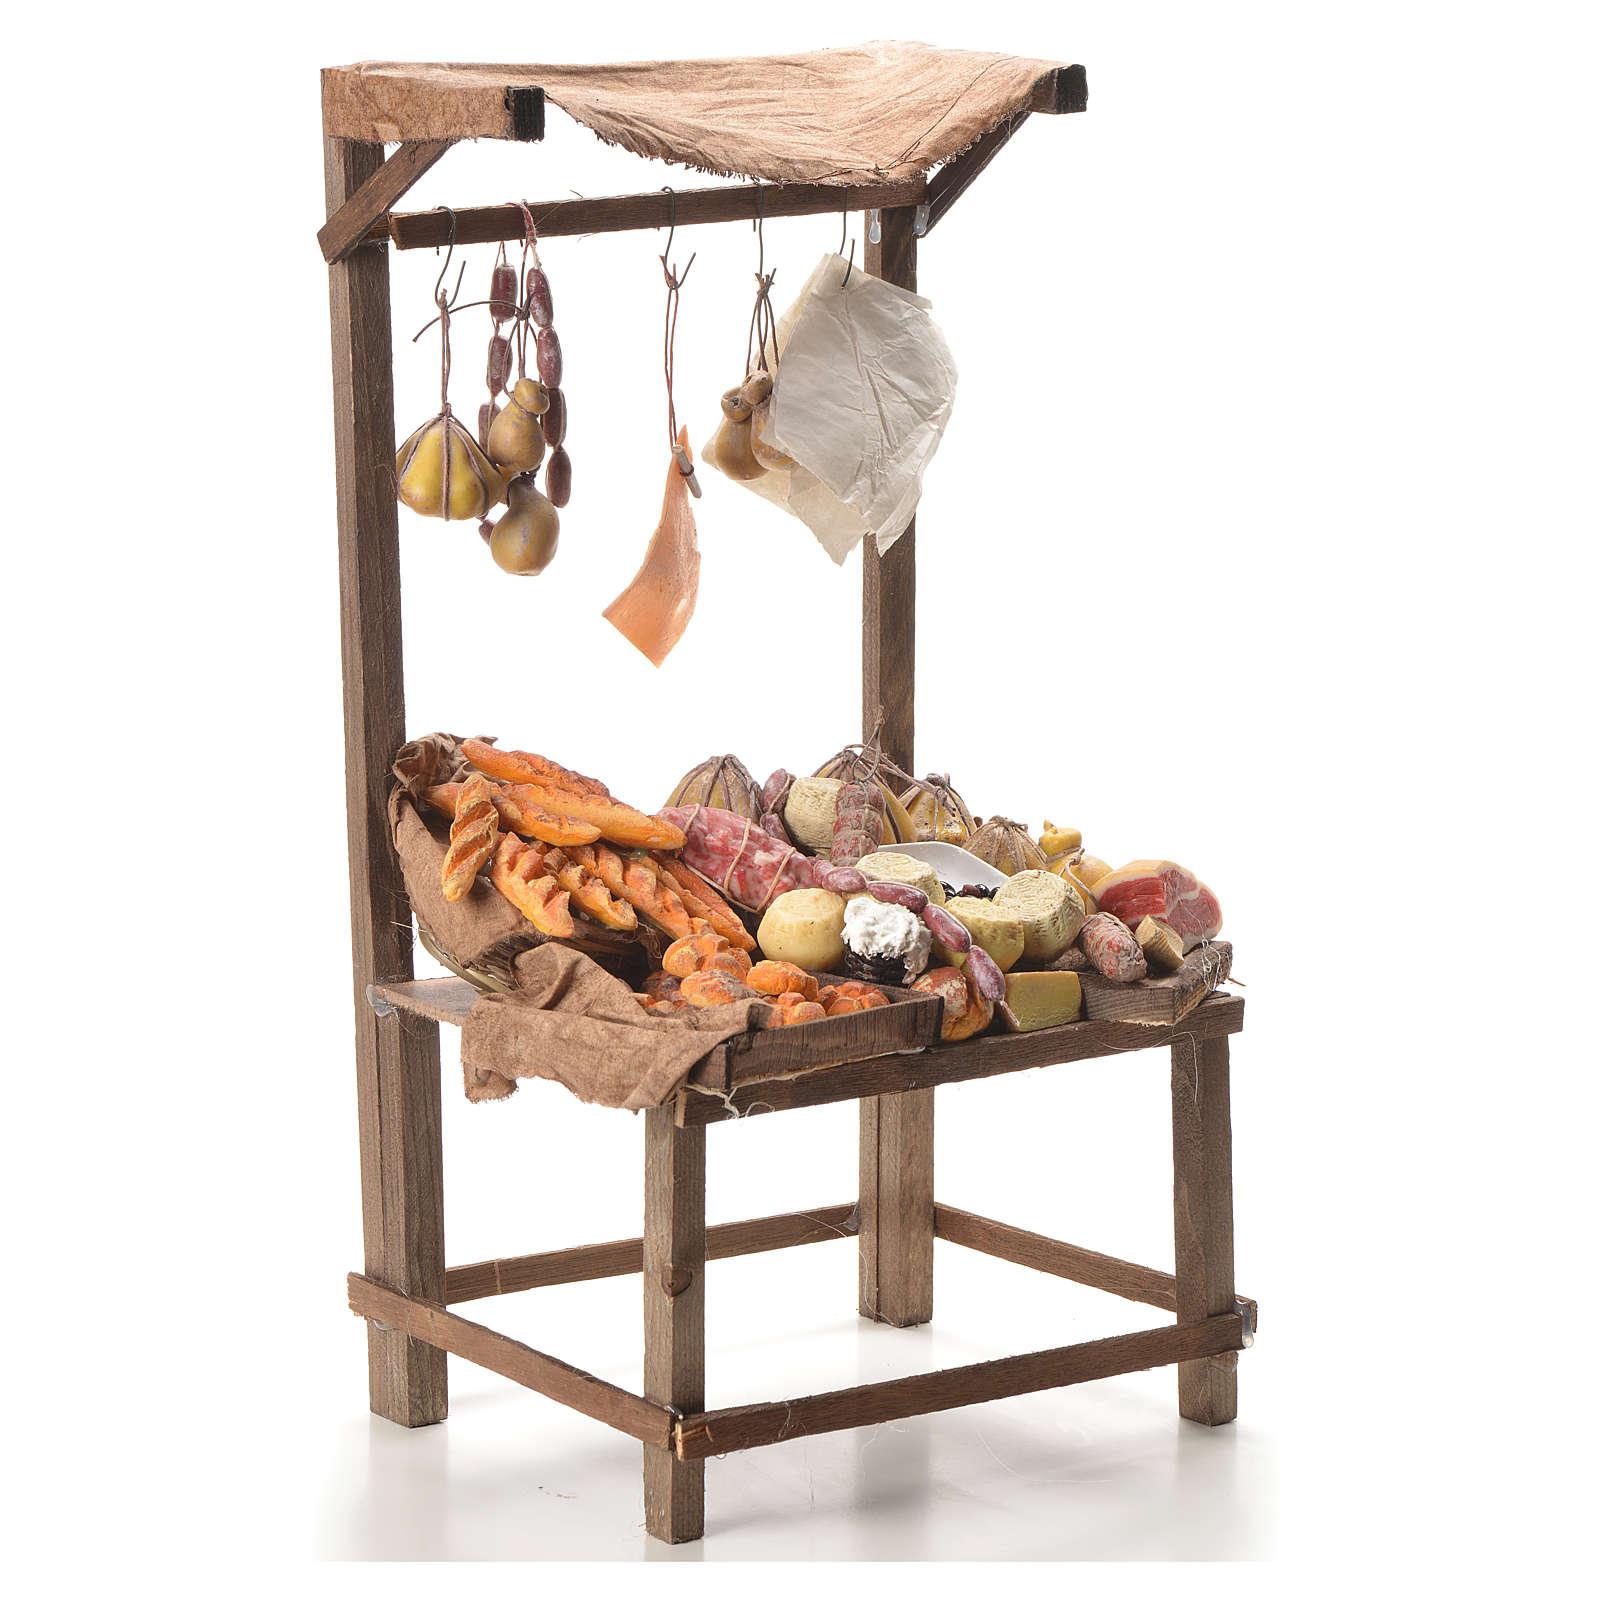 Banco pane formaggi salumi cera presepe 40x21x15 cm 4